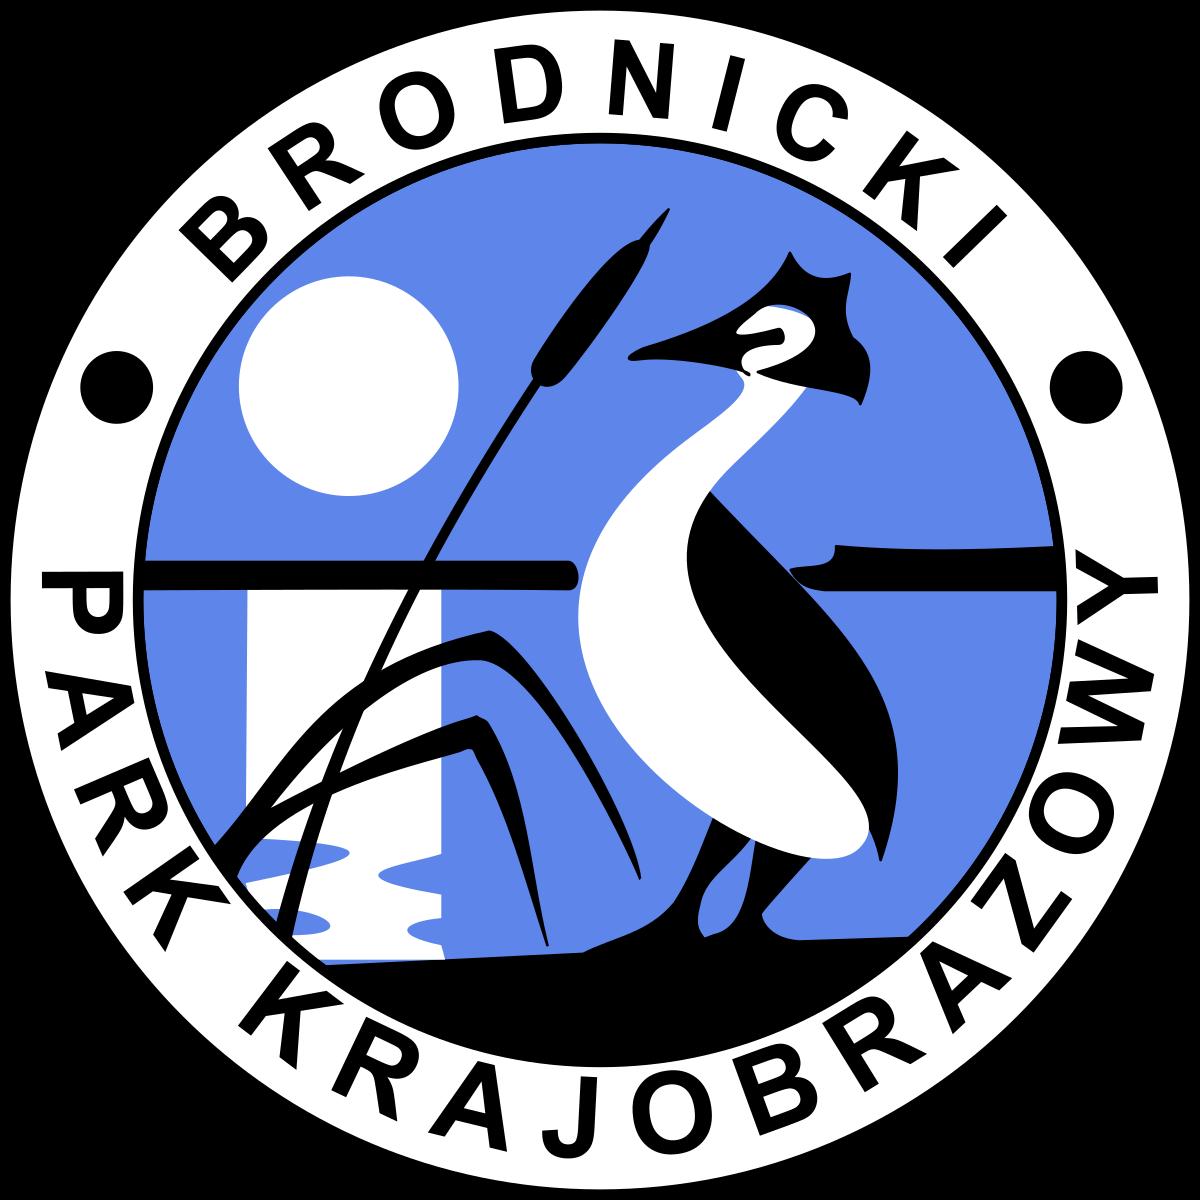 Clipart park park landscape. Brodnica wikipedia